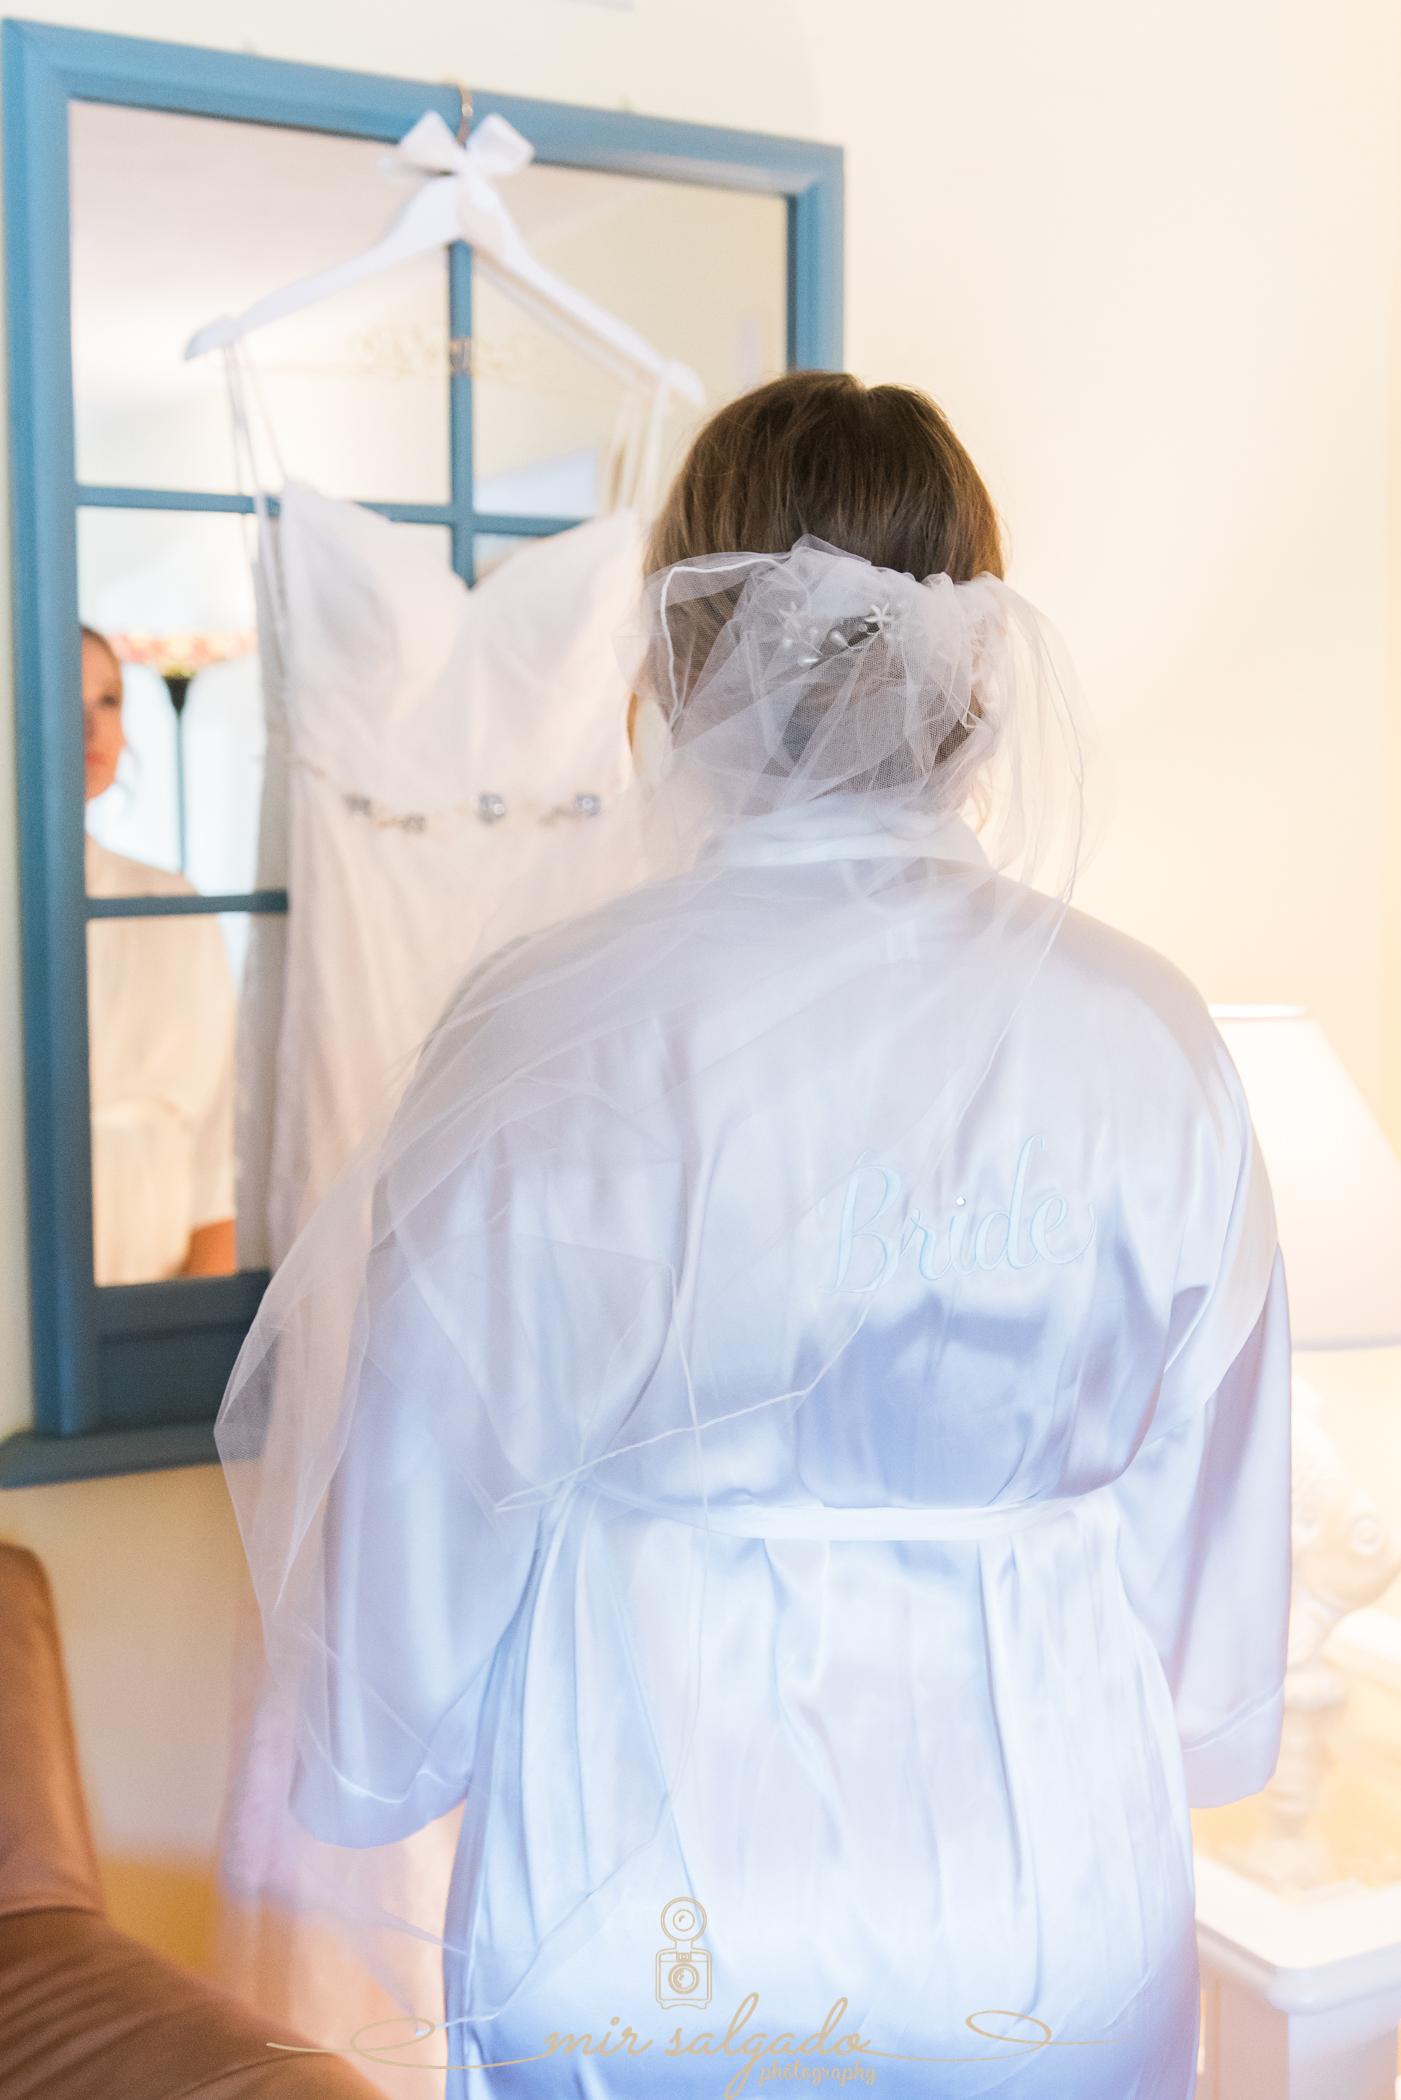 Sarasota-wedding-photographer, Tampa-wedding-photo, bride-getting-ready